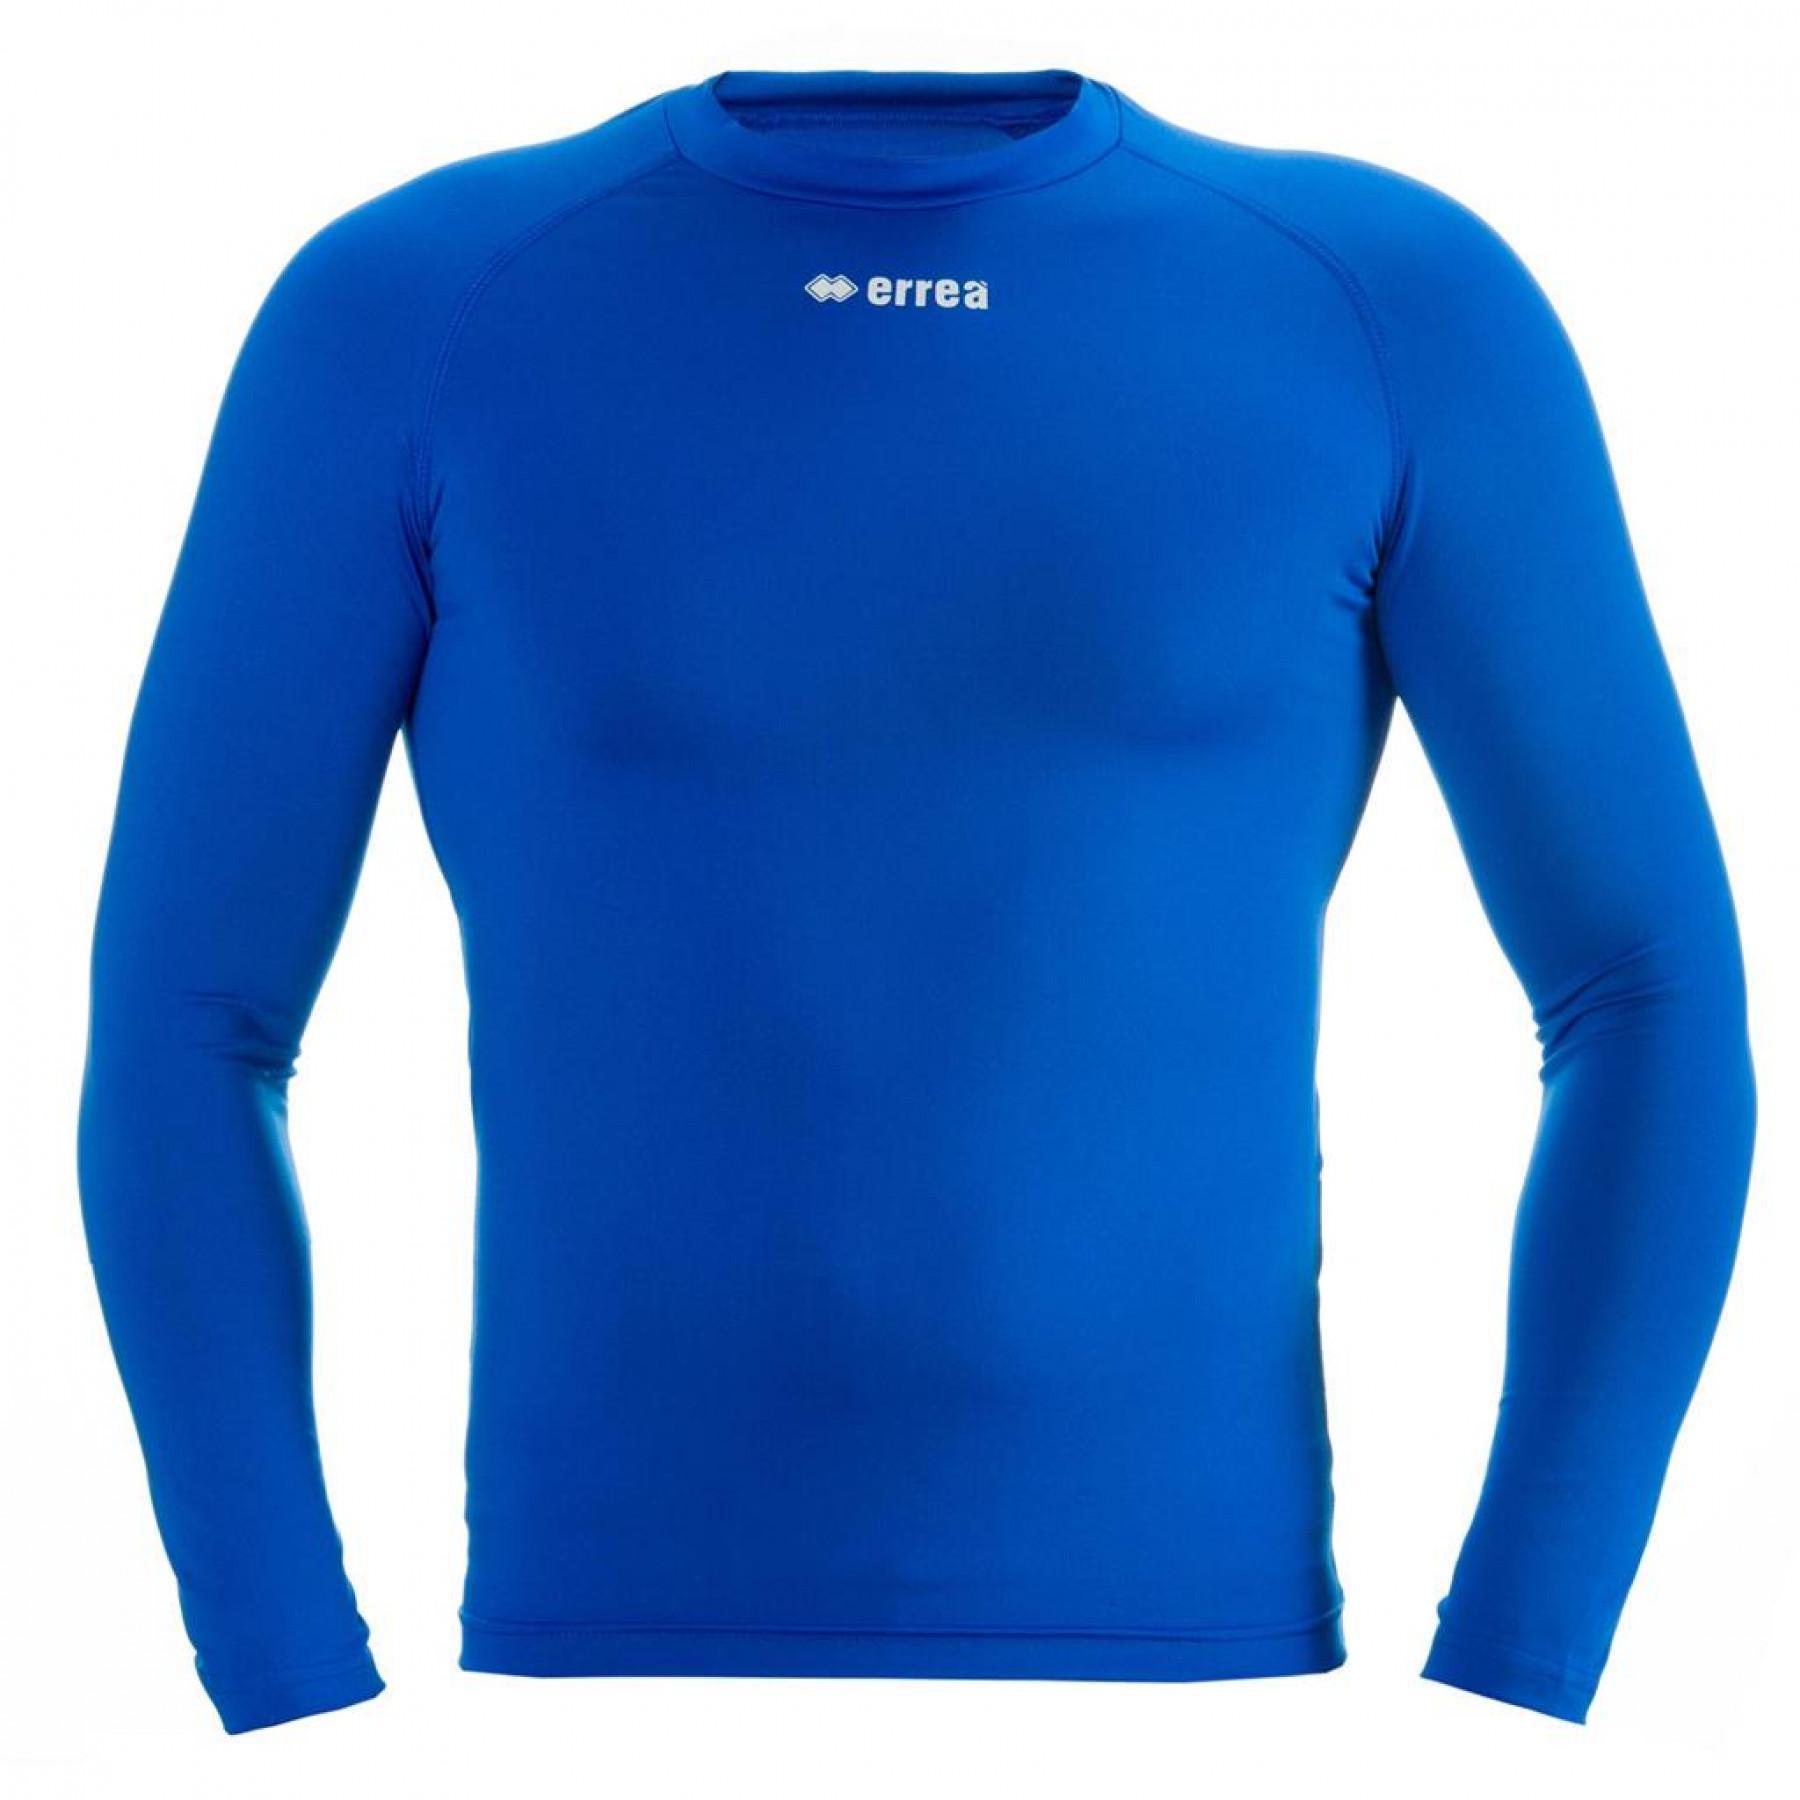 compression jersey long sleeve Junior Errea Ermes